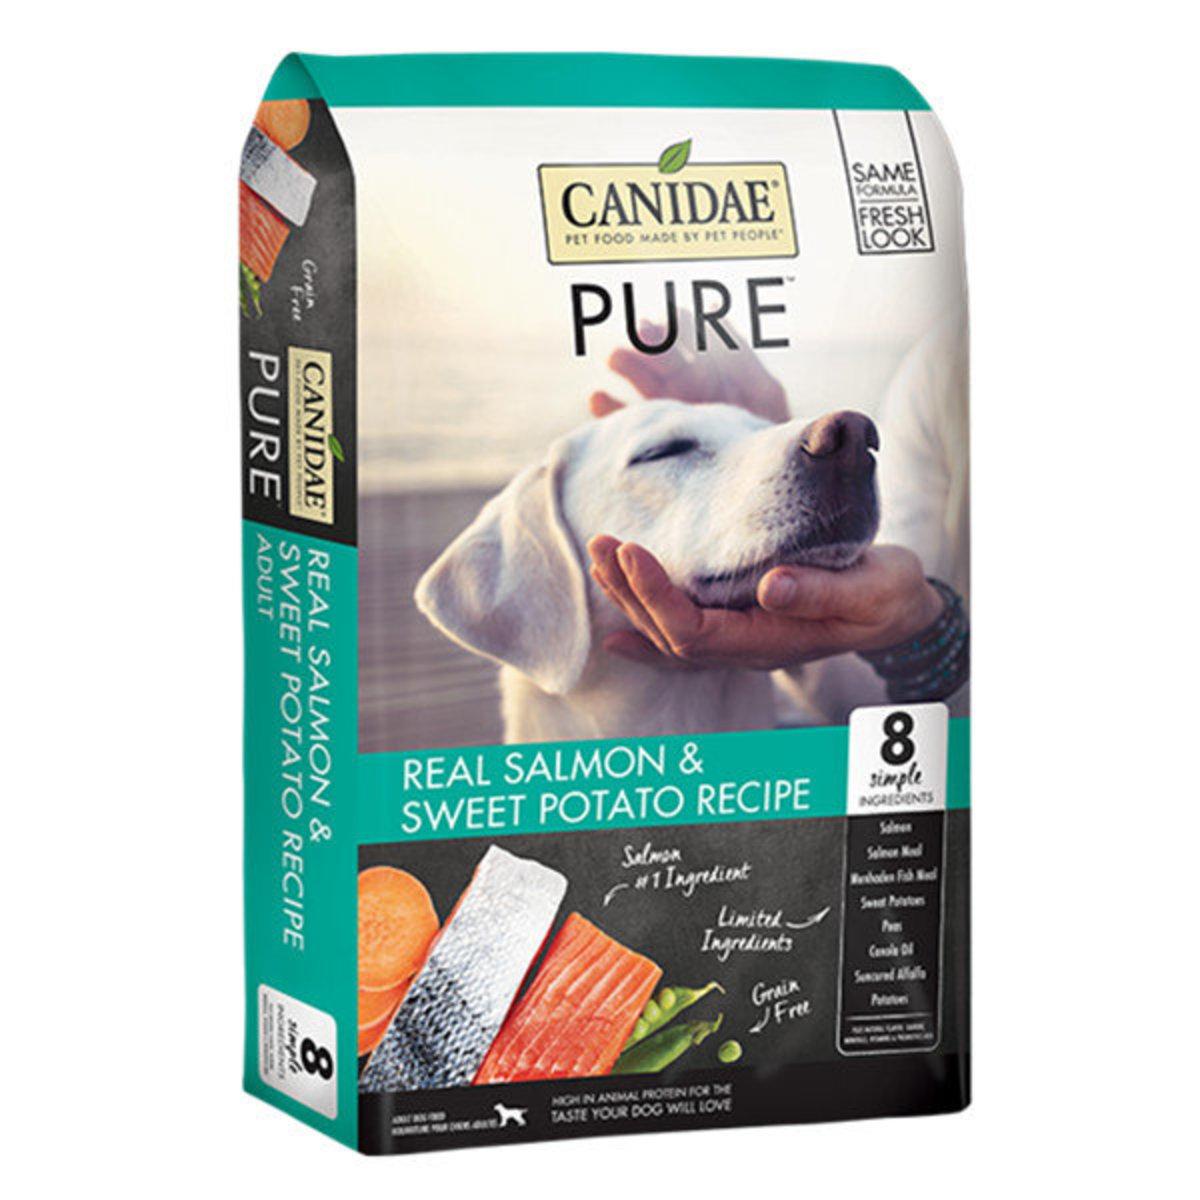 PURE Sea Gluten-free Marine formula salmon dry dog food 4lb [1348]